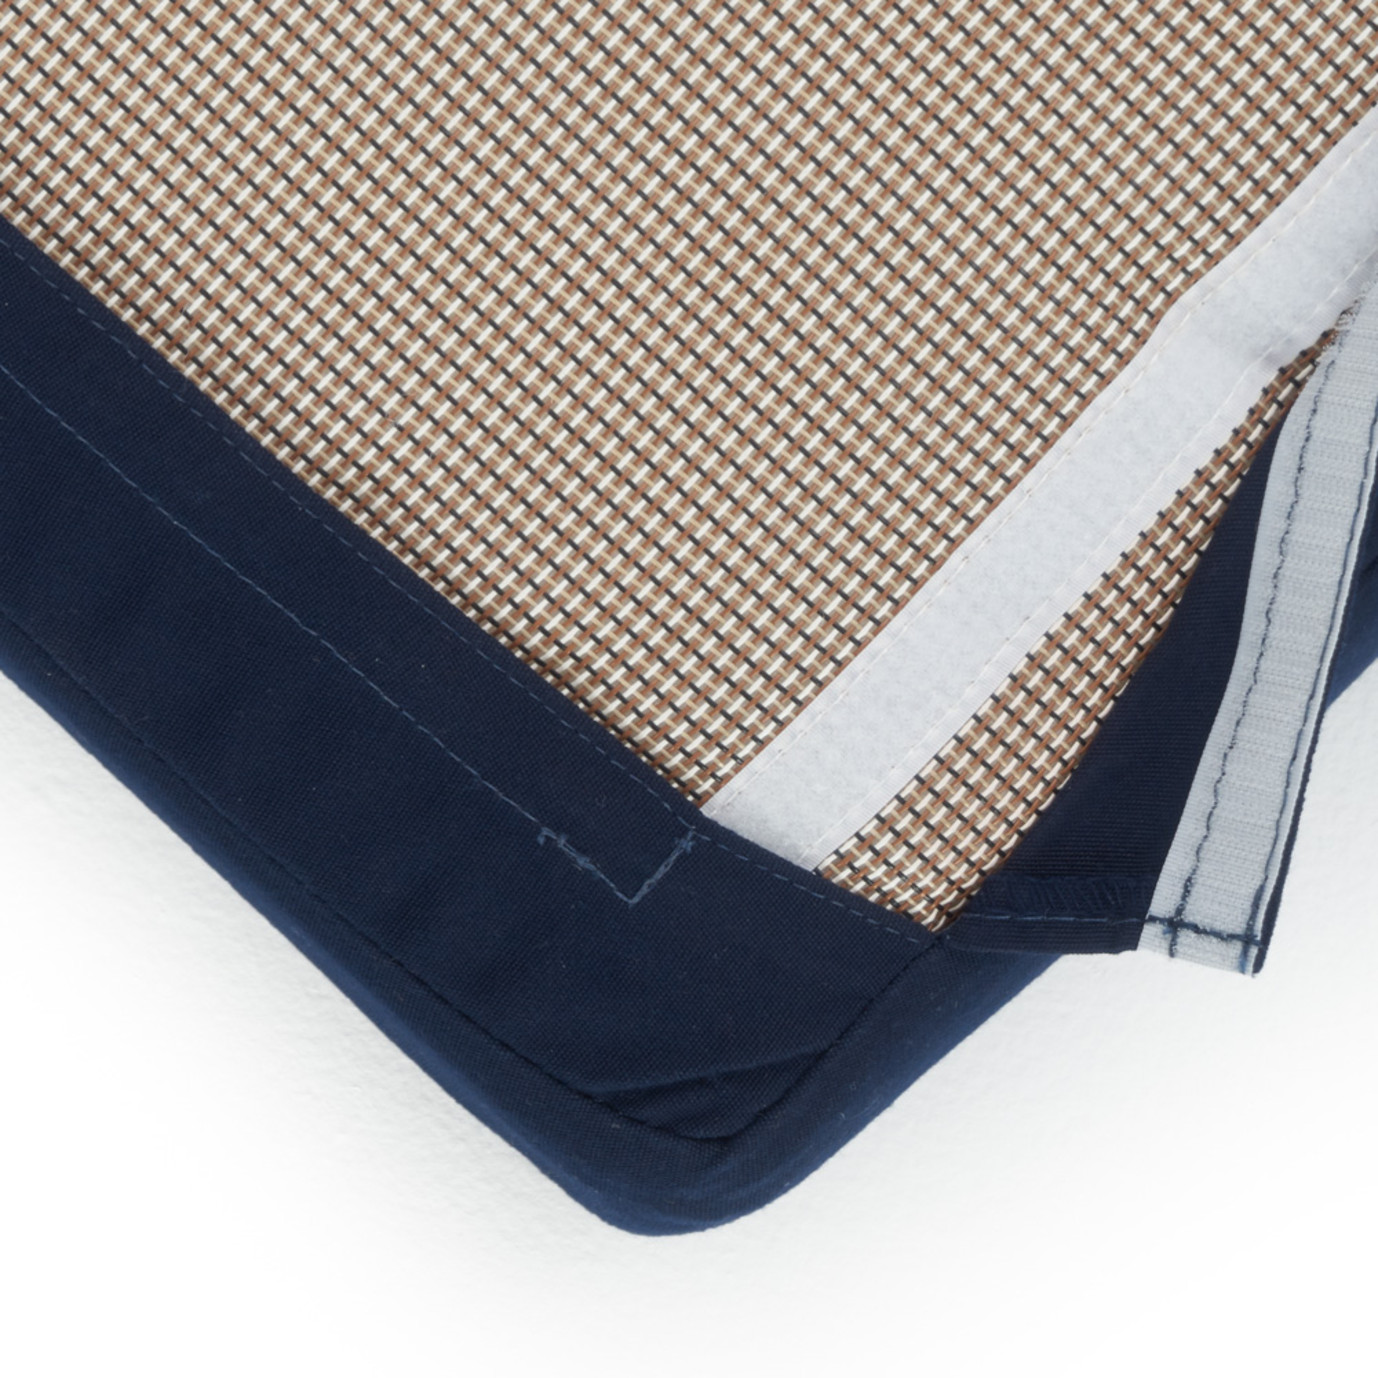 Deco™ Corner Chair - Navy Blue